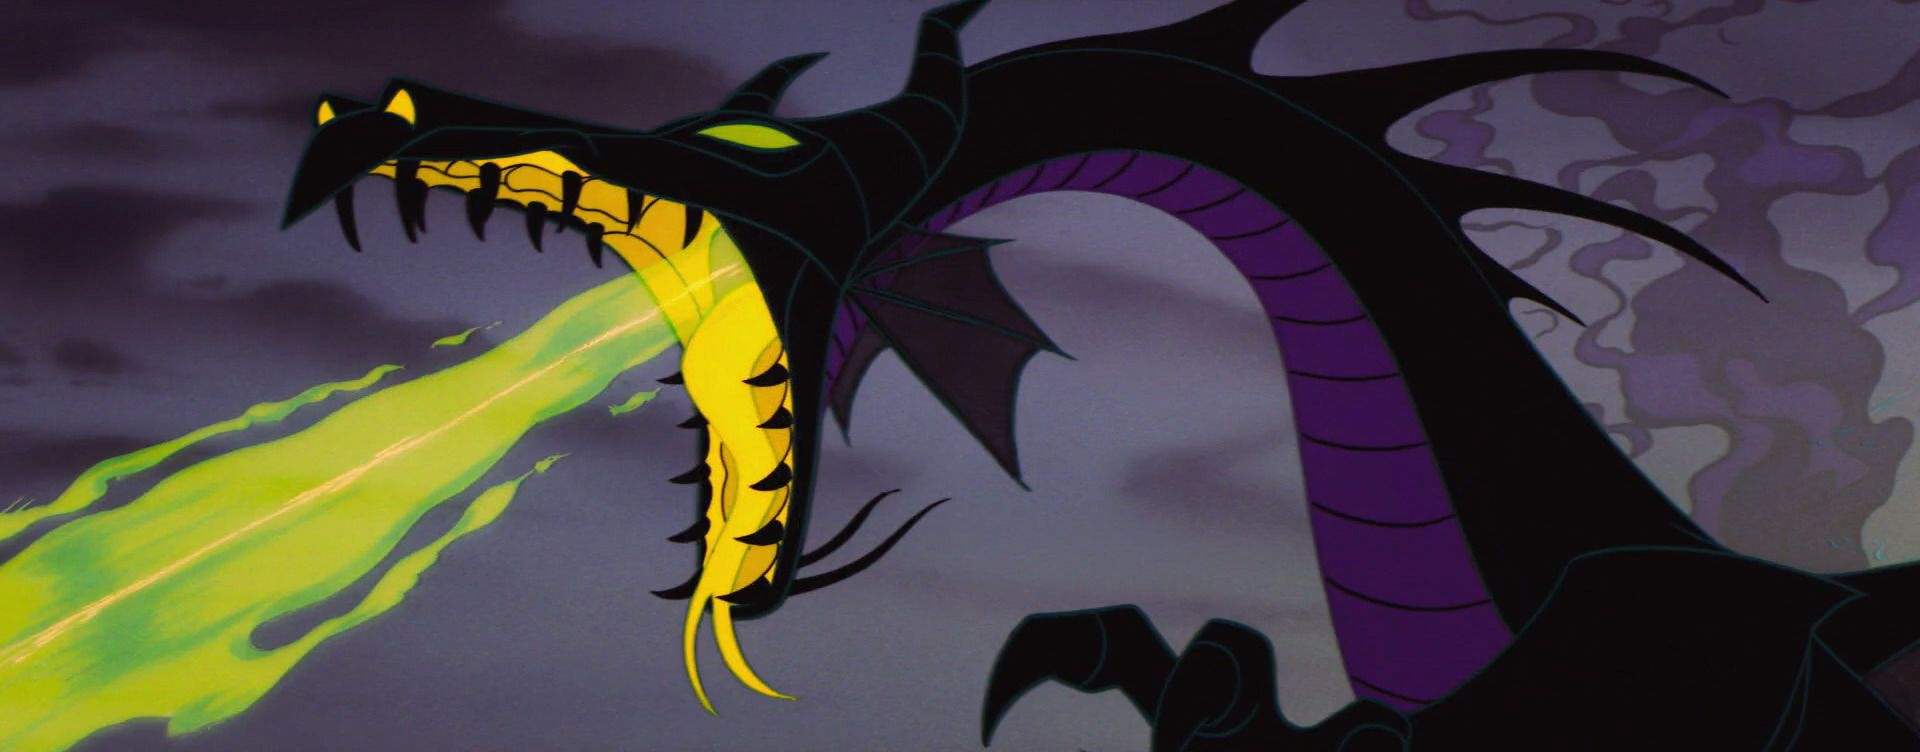 Maleficent Dragon Wallpaper Maleficent Dragon High...